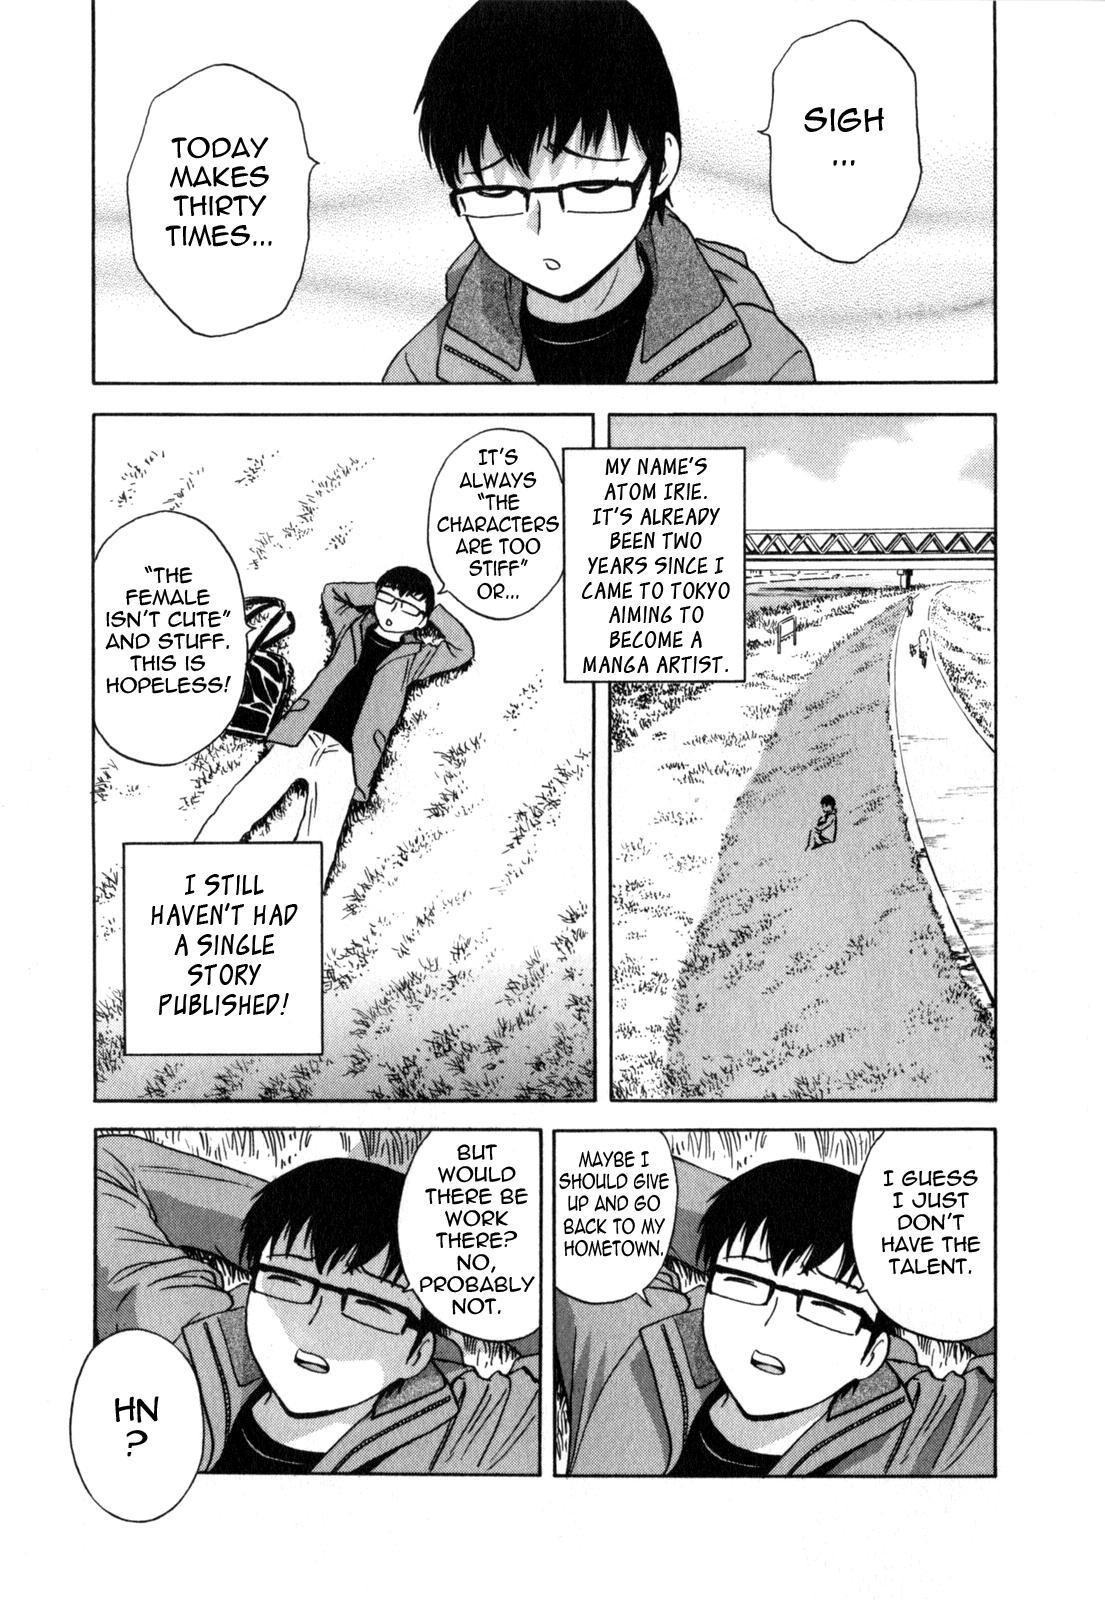 [Hidemaru] Life with Married Women Just Like a Manga 1 - Ch. 1-3 [English] {Tadanohito} 9